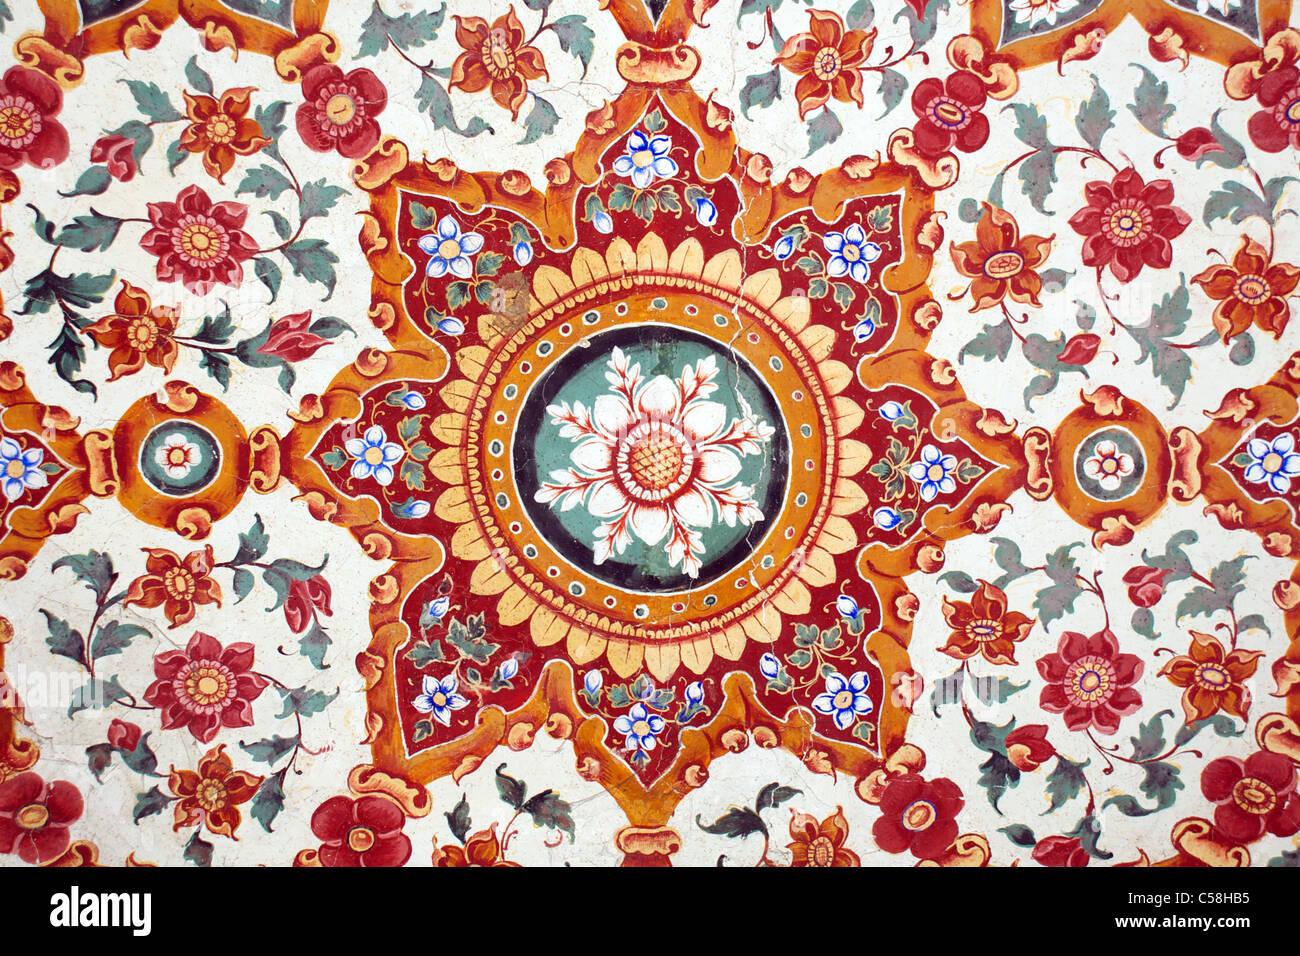 Black Marble Wallpaper Mughal Art Stock Photos Amp Mughal Art Stock Images Alamy